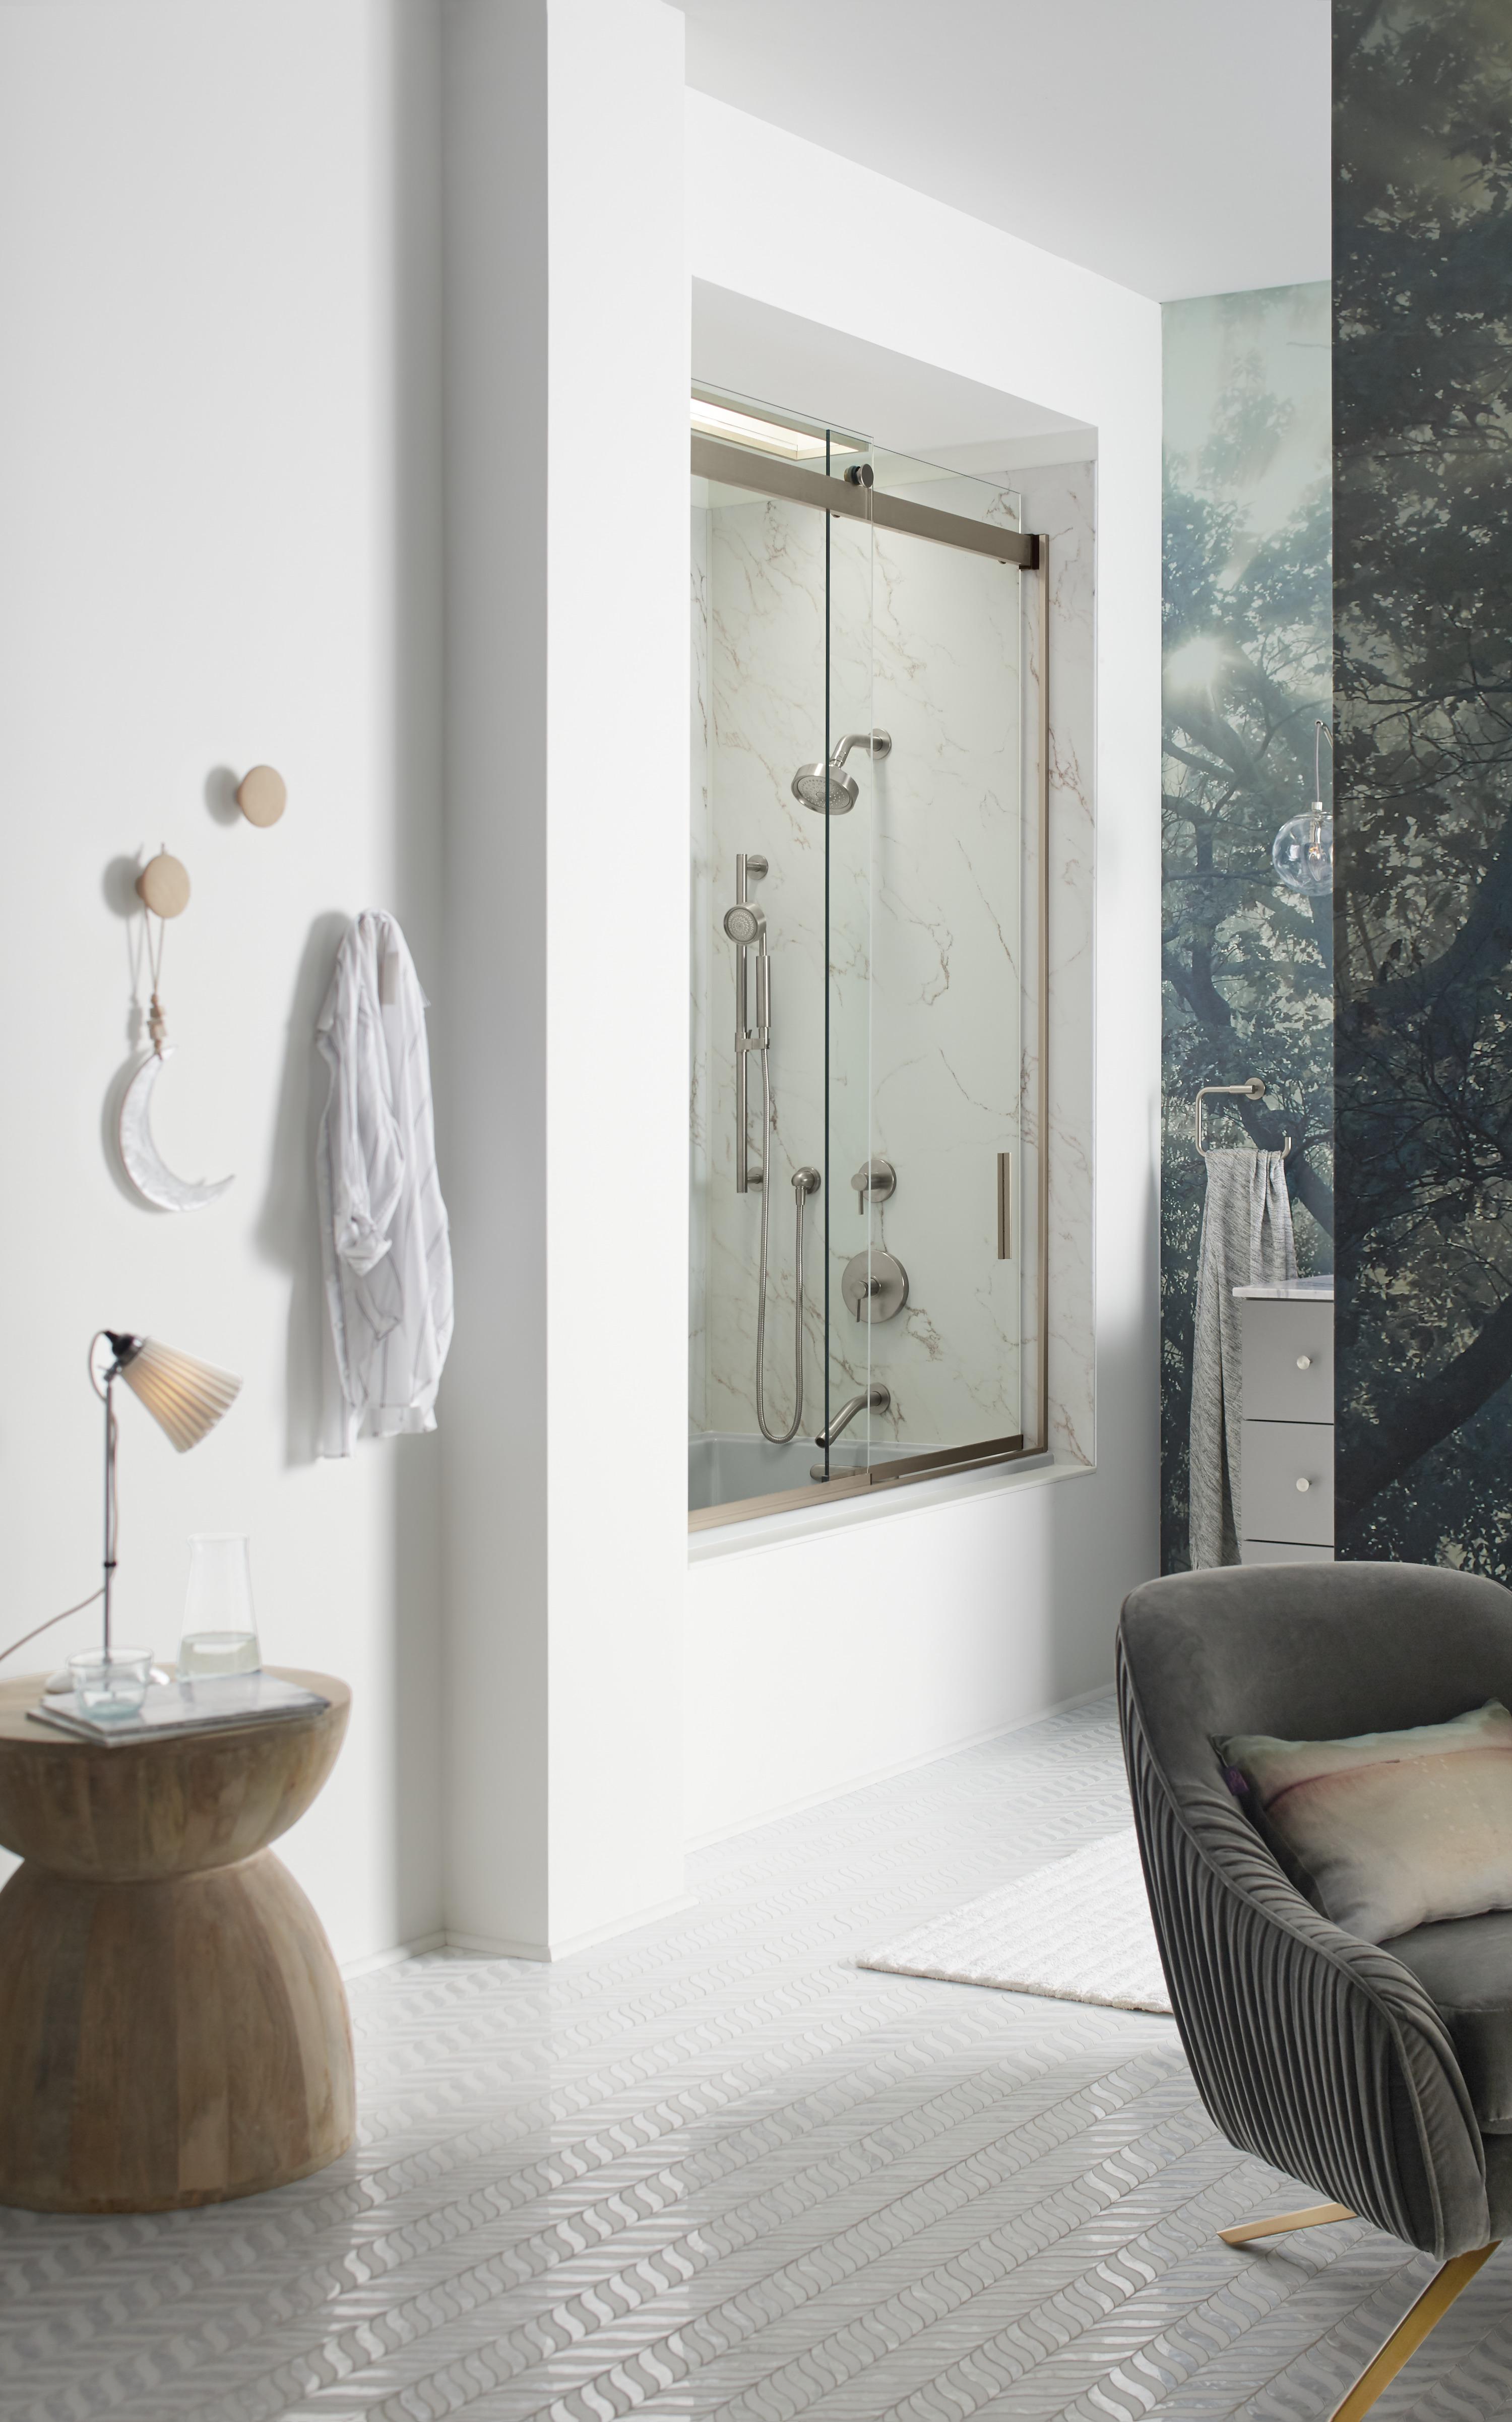 Levity® shower door     Choreograph® shower walls     Purist® handshower     Purist Showerhead     Stillness® valve trim     A glass shower door, rather than a shower curtain, makes a small space feel more open.